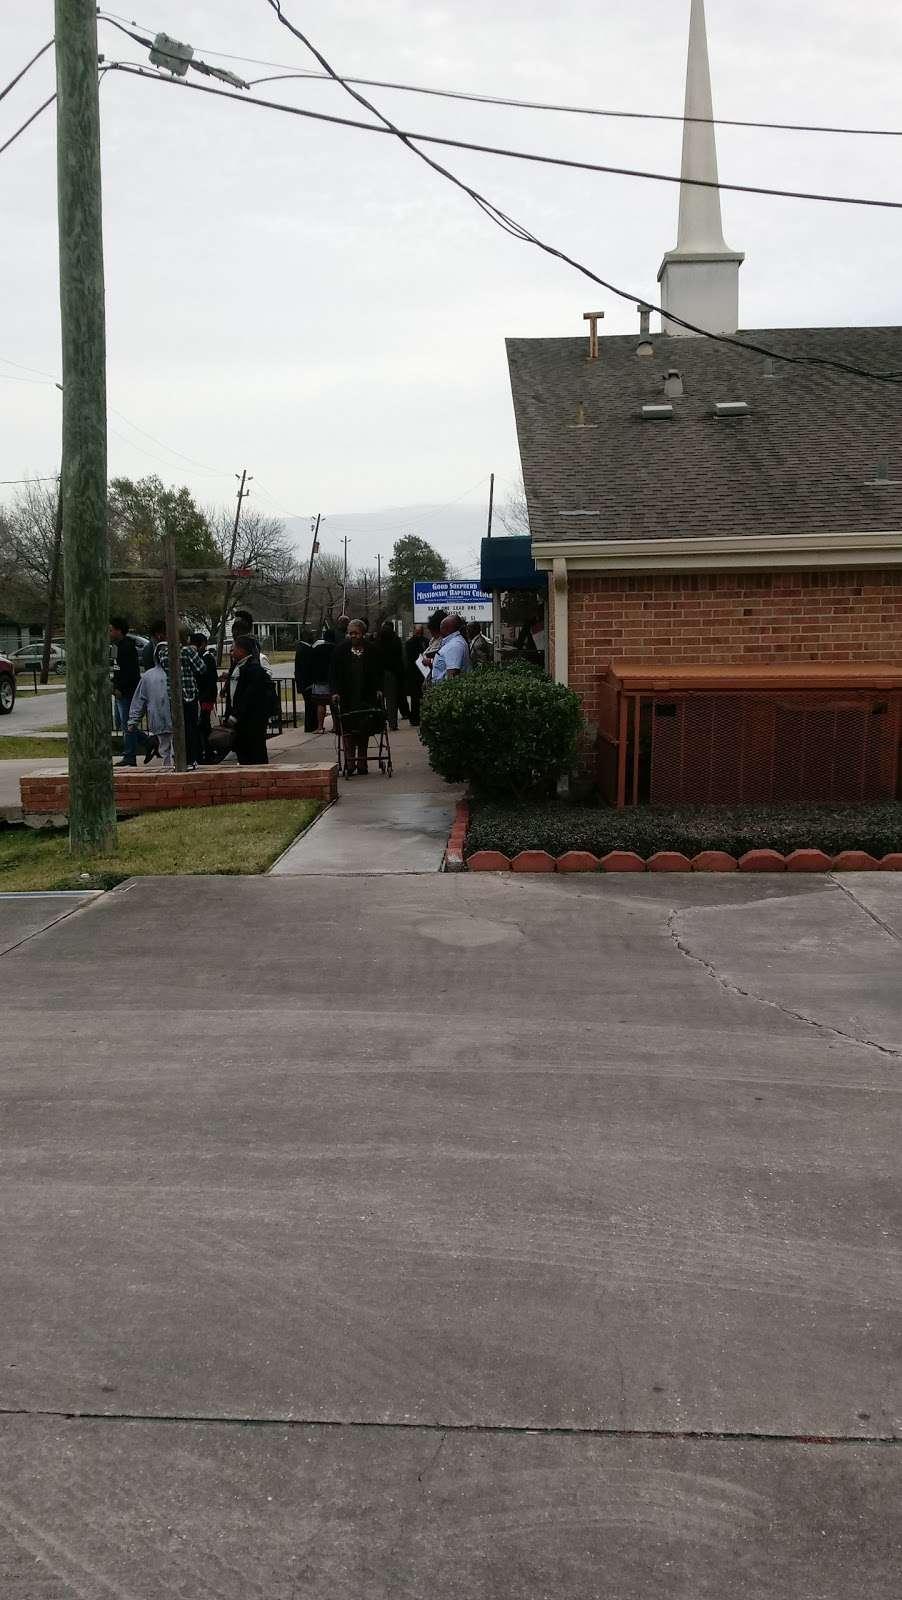 Good Shepherd Baptist Church - church  | Photo 3 of 4 | Address: 7818 Bonaire St, Houston, TX 77028, USA | Phone: (713) 672-9847